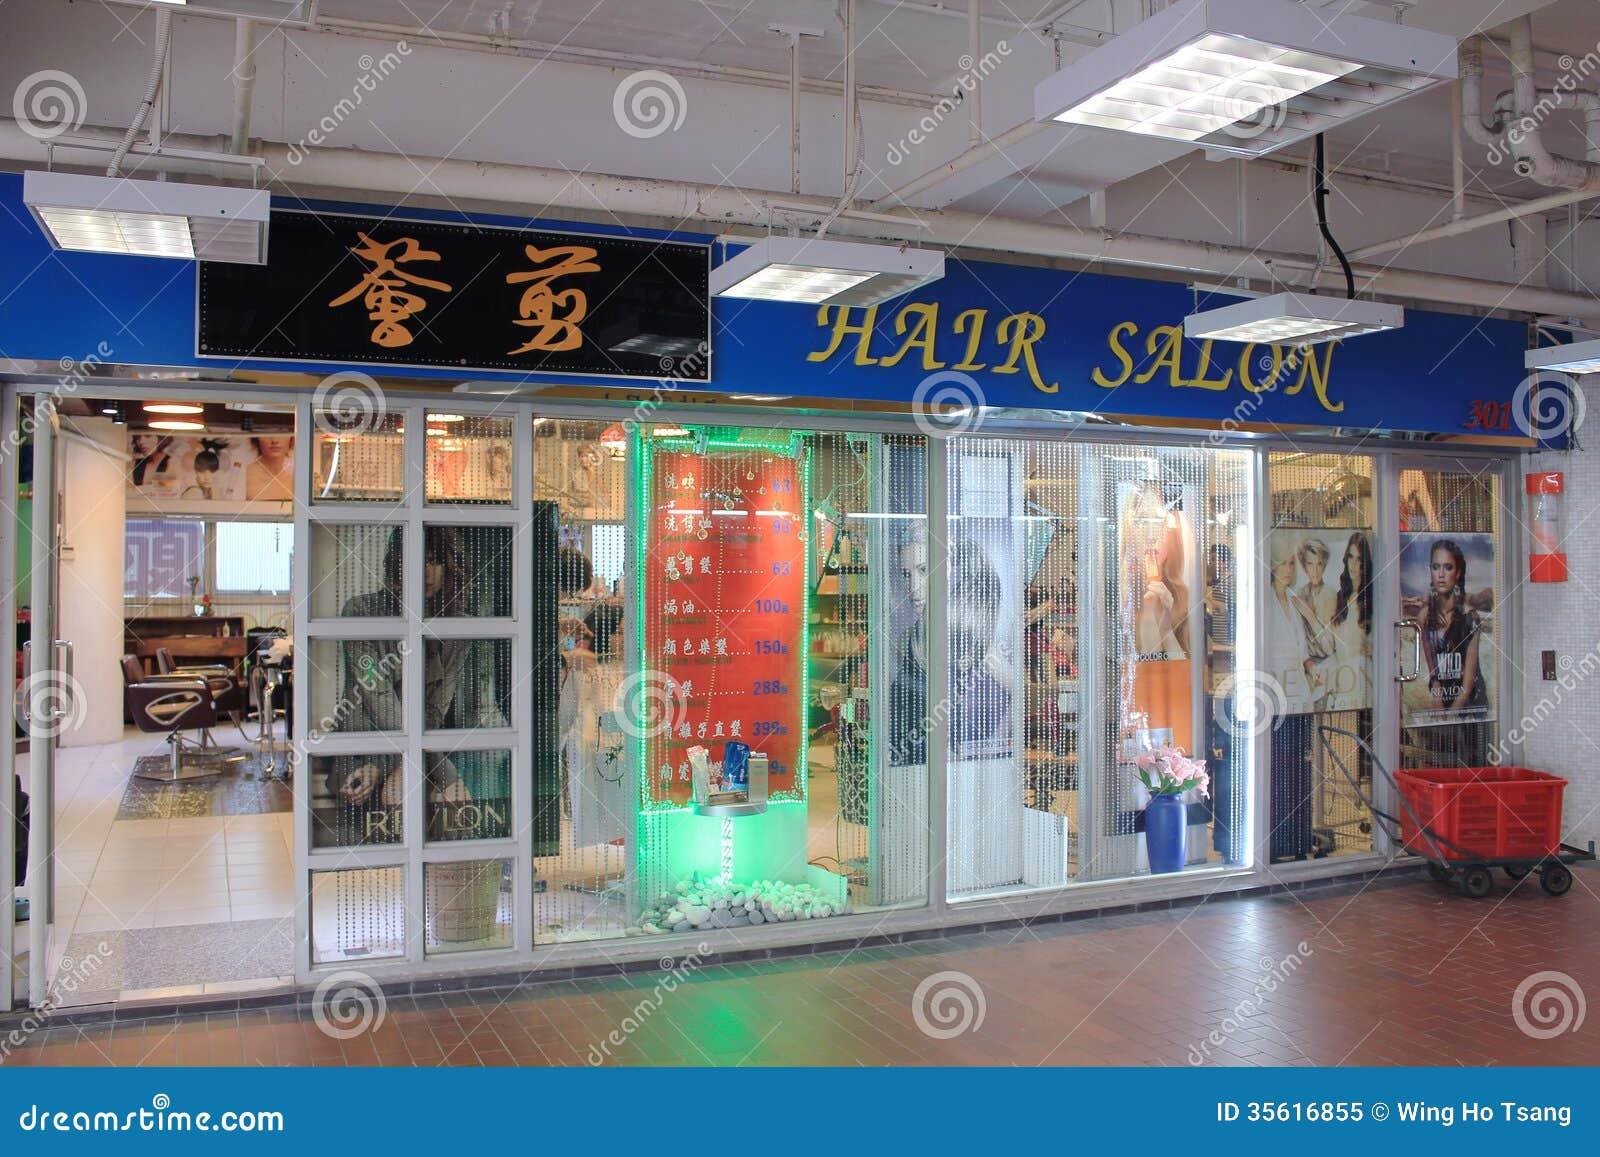 Hair salon in hong kong editorial image image 35616855 for Hair salon hk